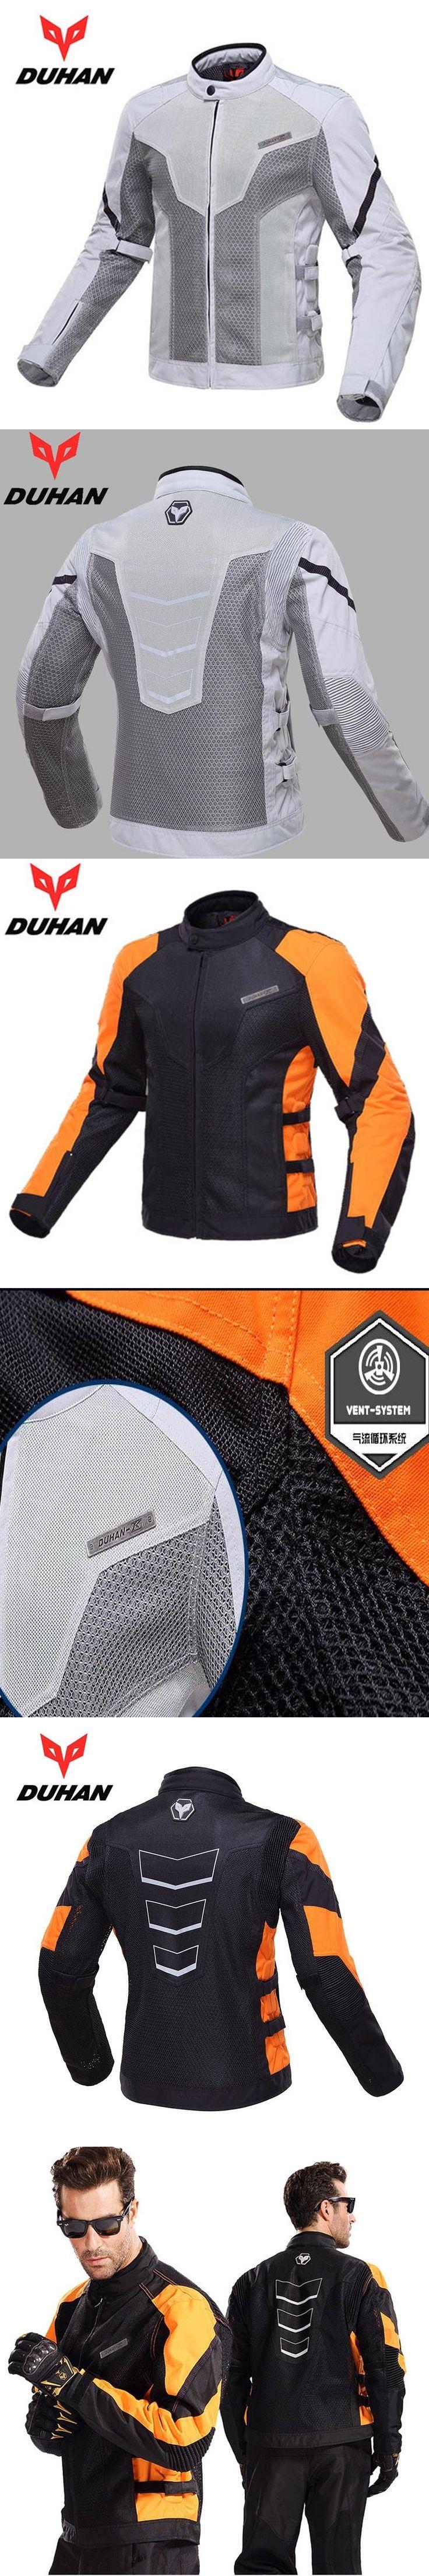 Duhan Men summer Breathable Mesh Cloth Motocross Off-Road Racing jacket motorbike clothing Motorcycle jacket